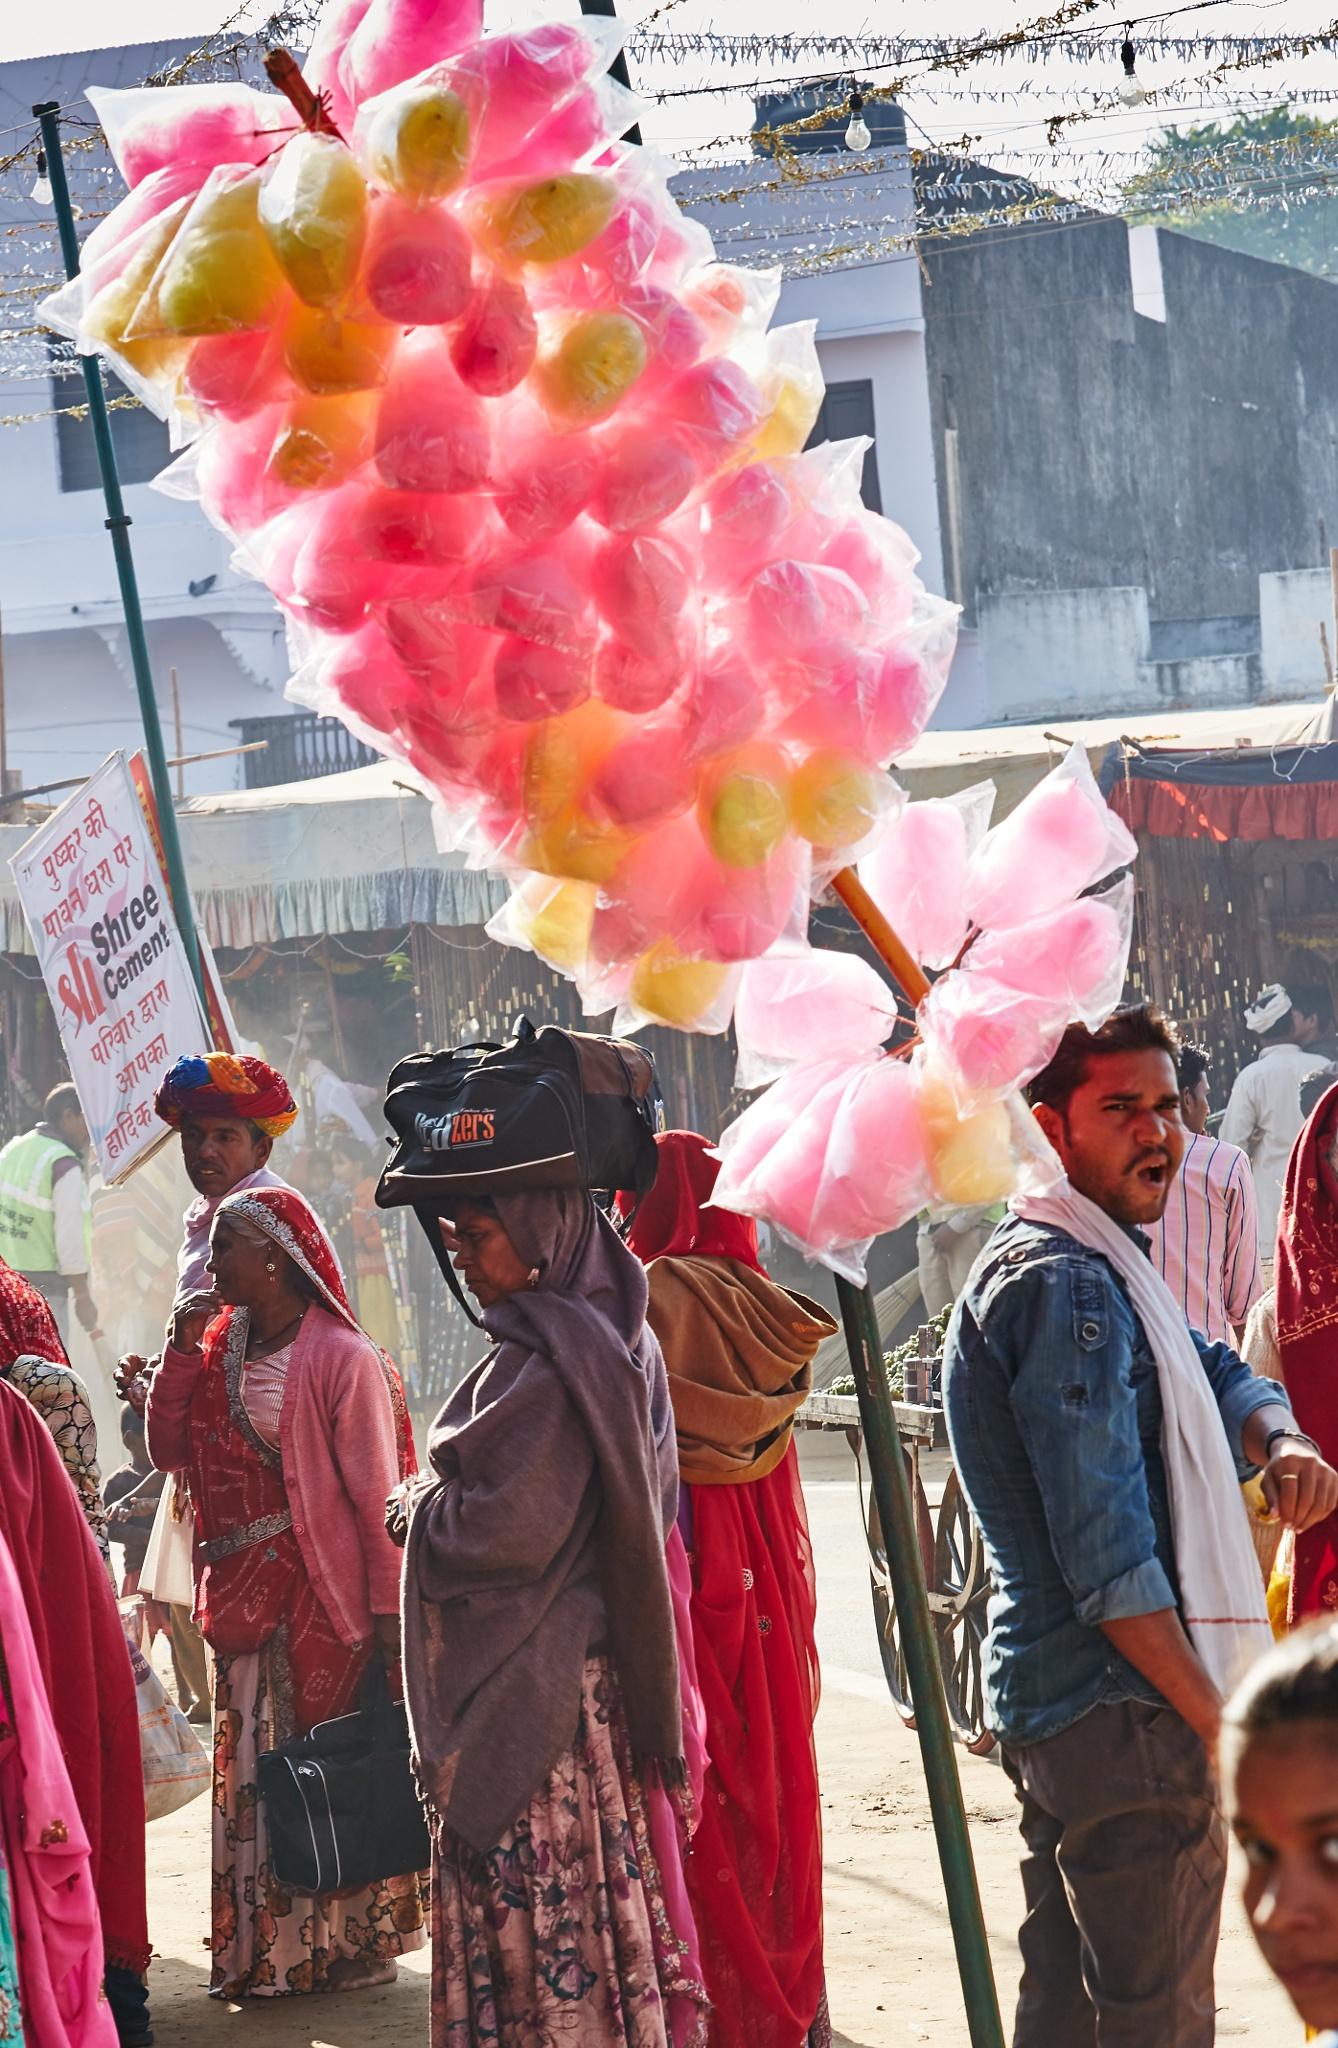 Pushkar, India street shot 014 by PatrickLeeKKAh9